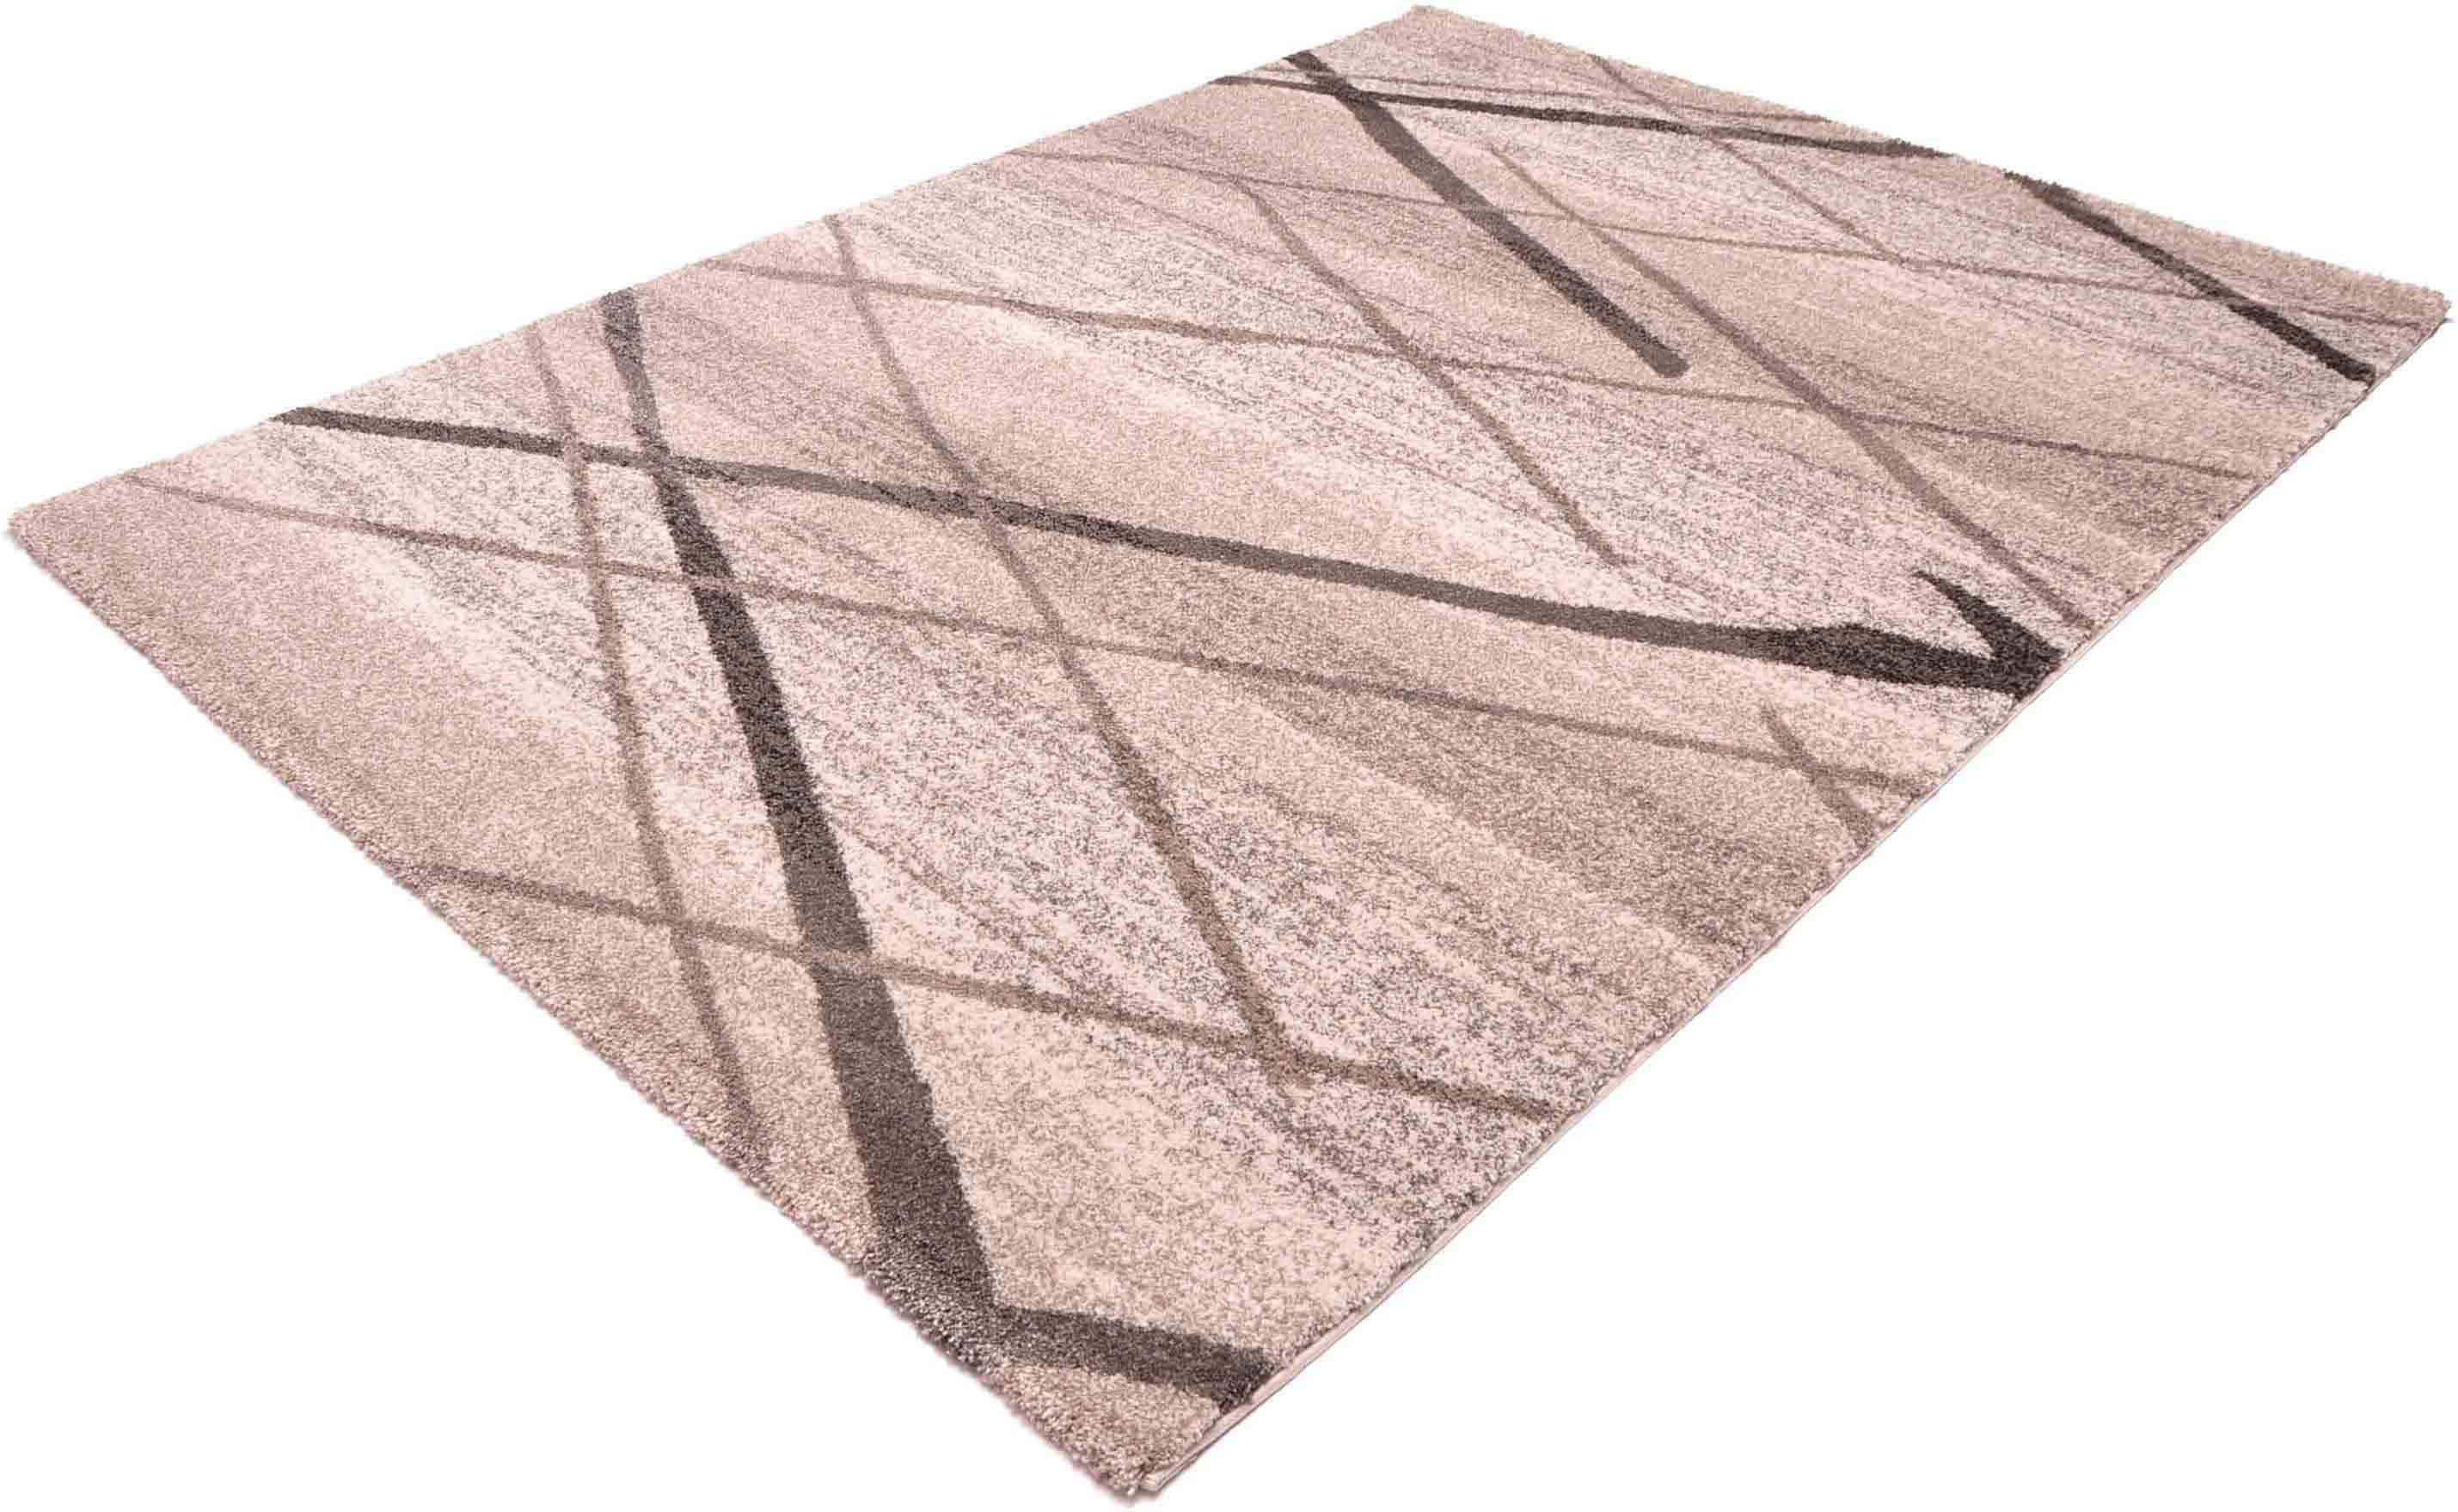 Teppich Gabeh 1100 Böing Carpet rechteckig Höhe 20 mm maschinell zusammengesetzt